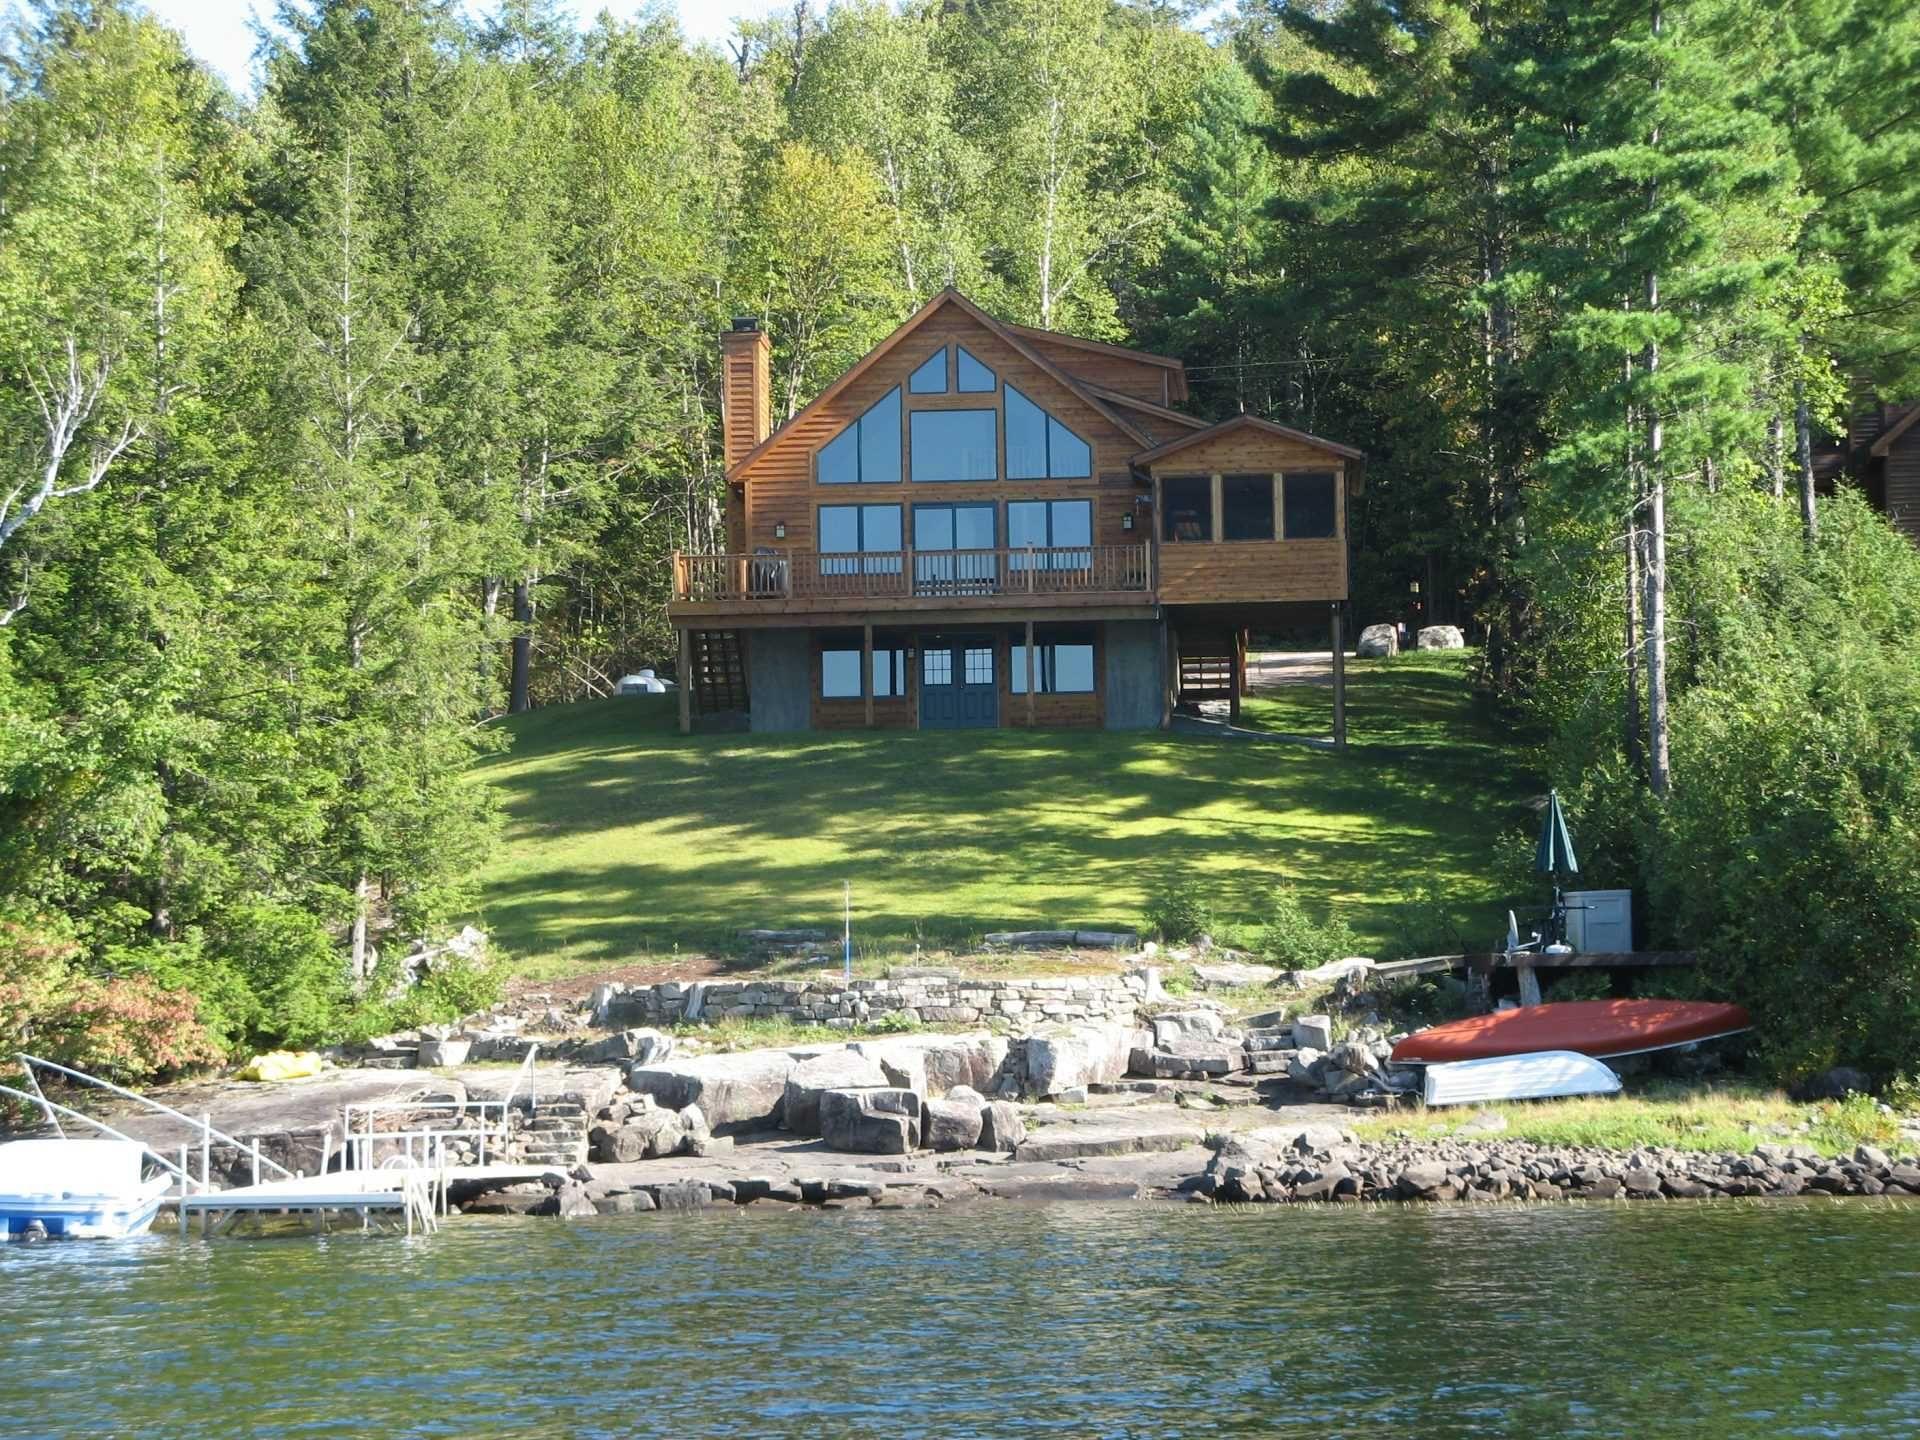 Pin By Renata Daniel On Lake House Designs Lakefront Homes Backyard Luxury Log Cabins